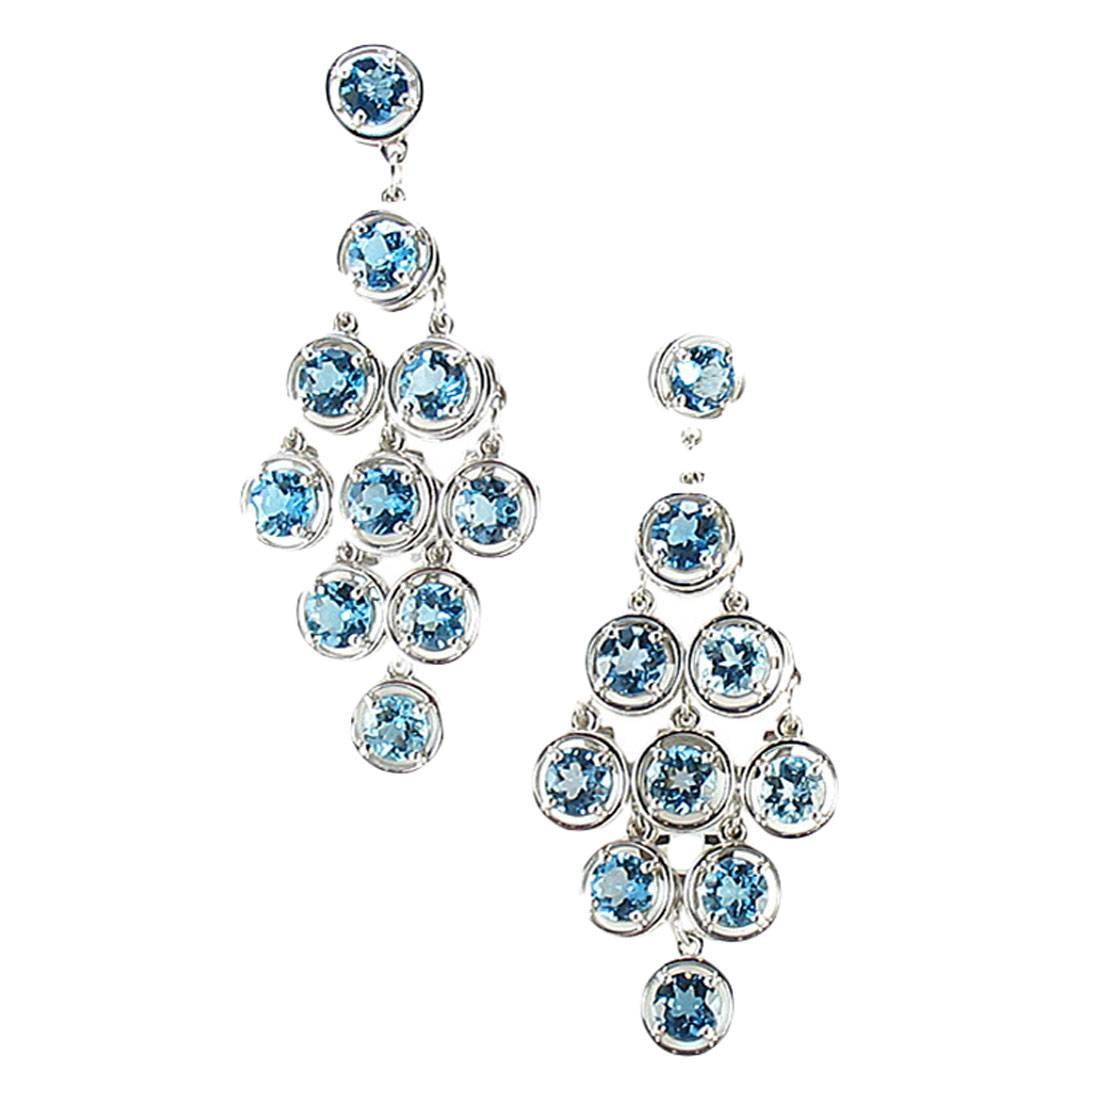 Blue Topaz Gold Chandelier Earrings For Sale At 1stdibs